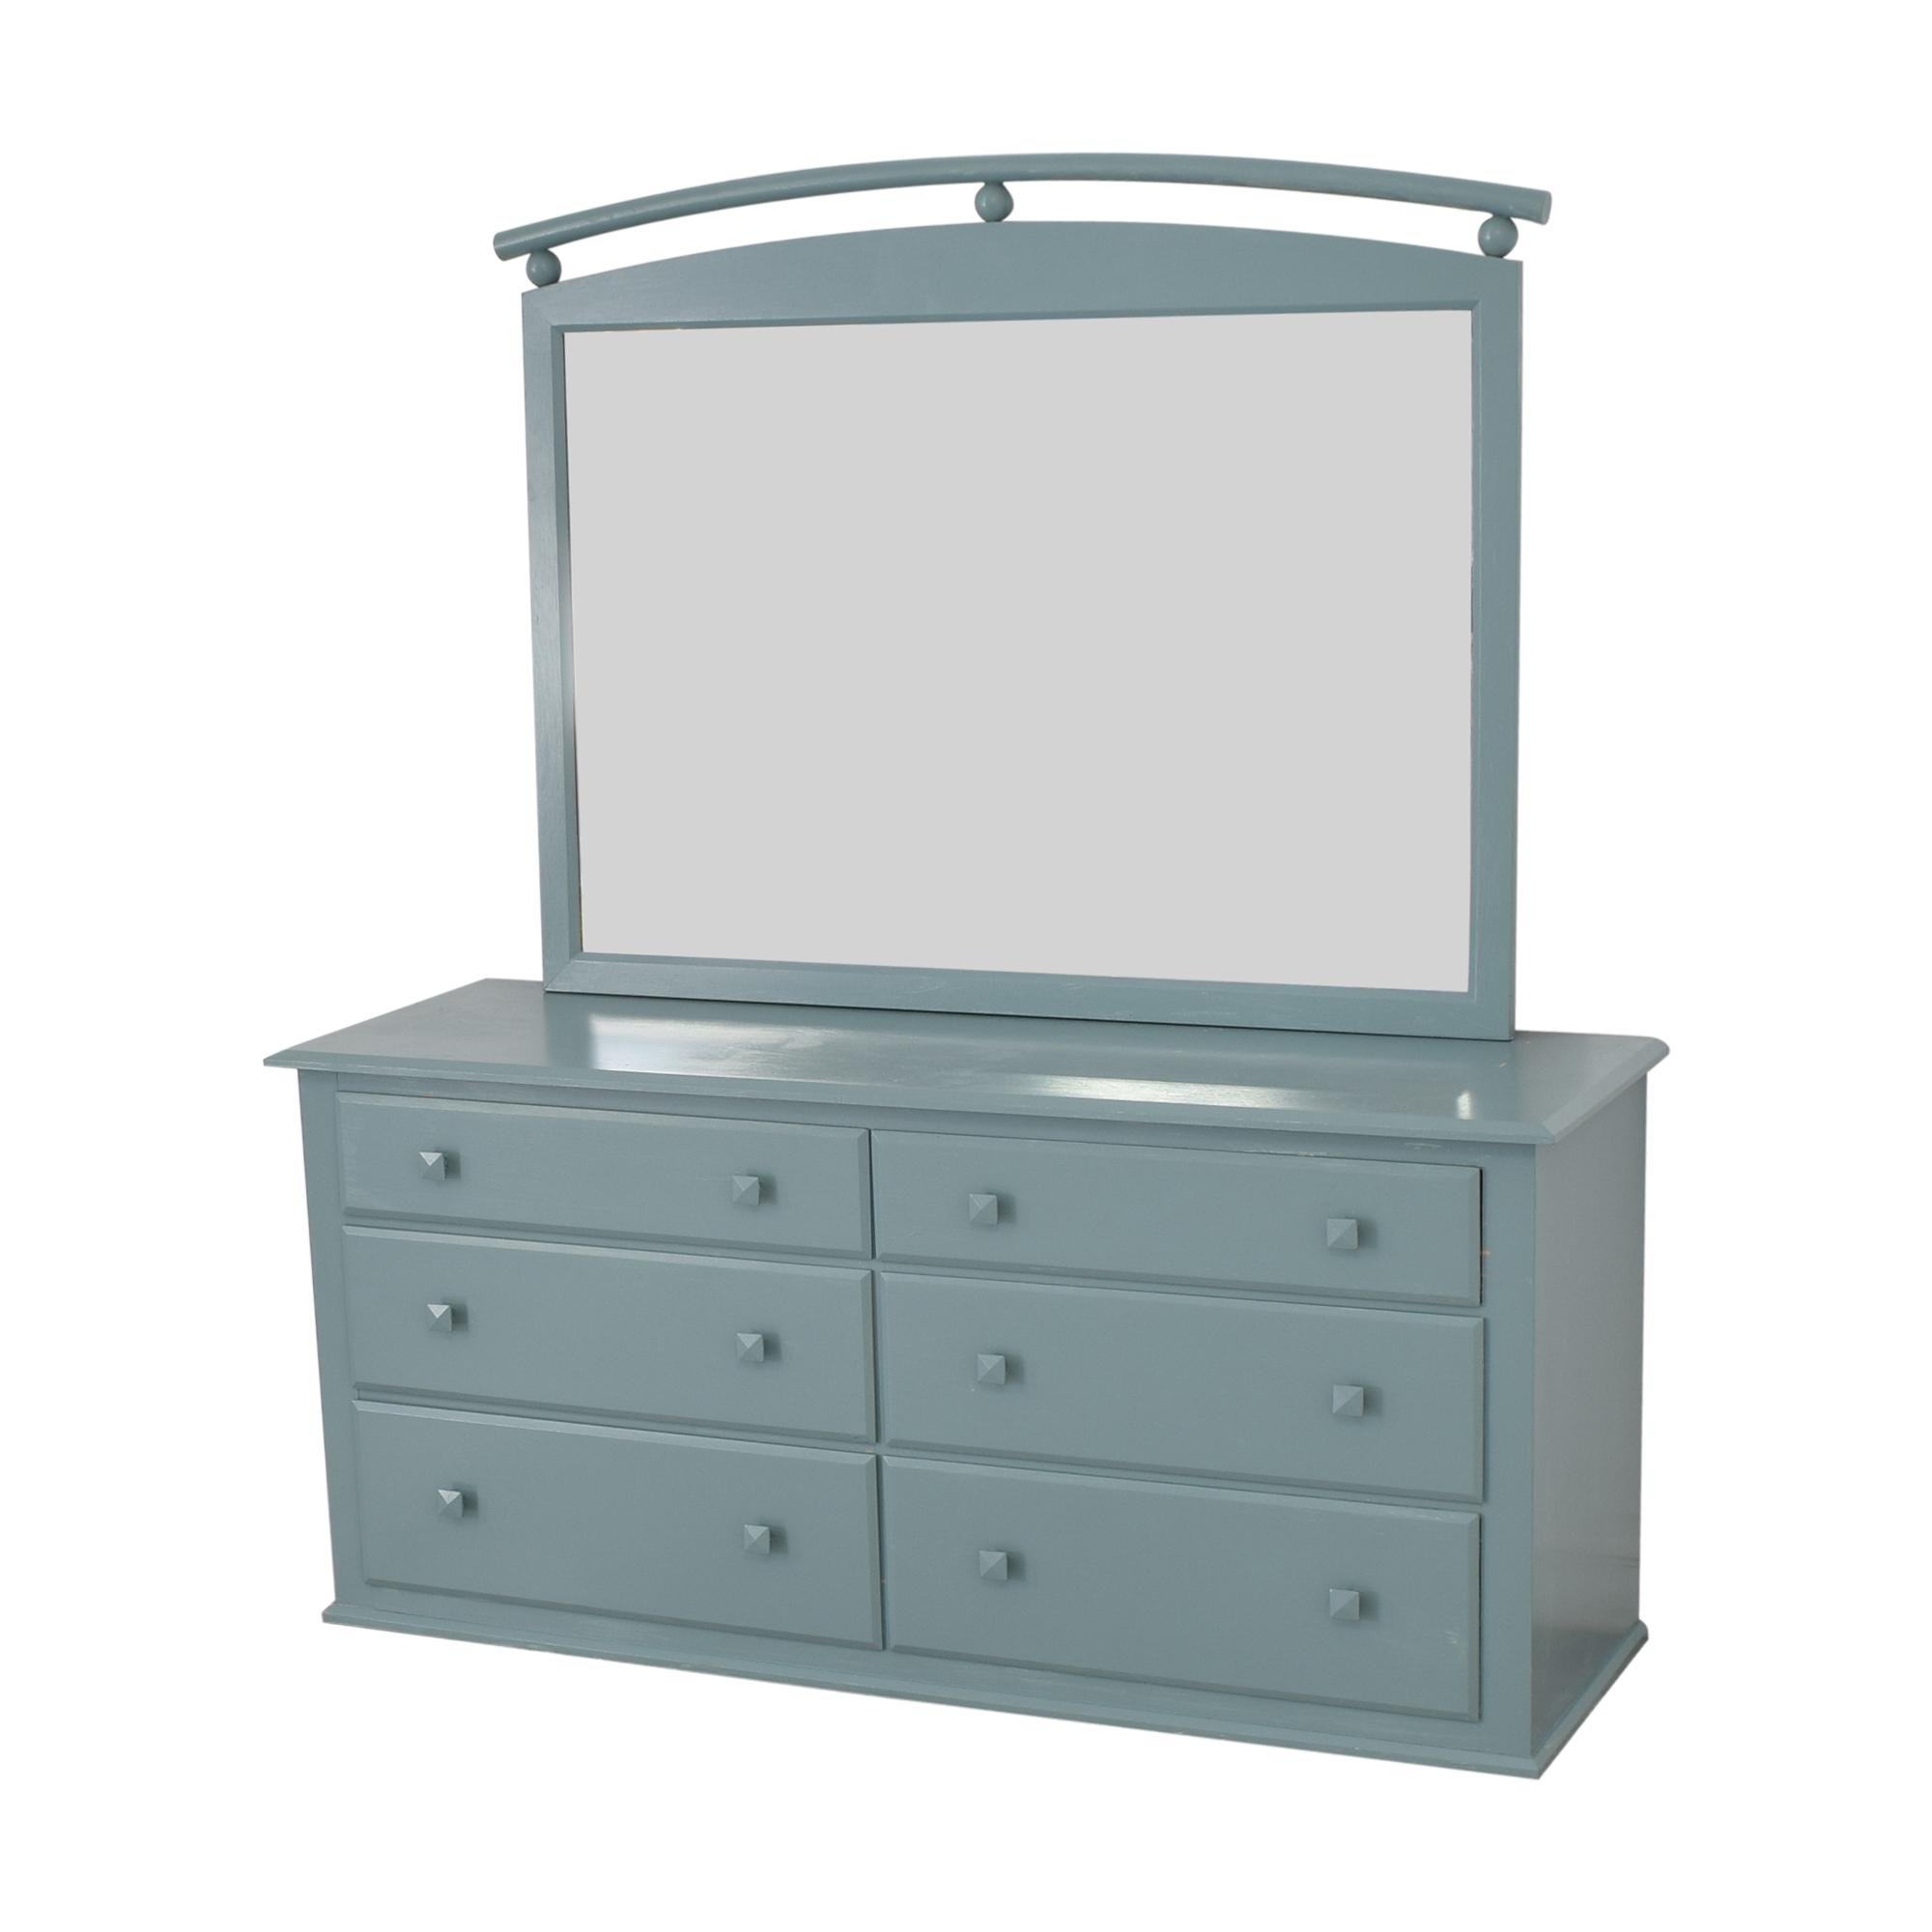 shop Ethan Allen American Dimensions Dresser with Mirror Ethan Allen Dressers